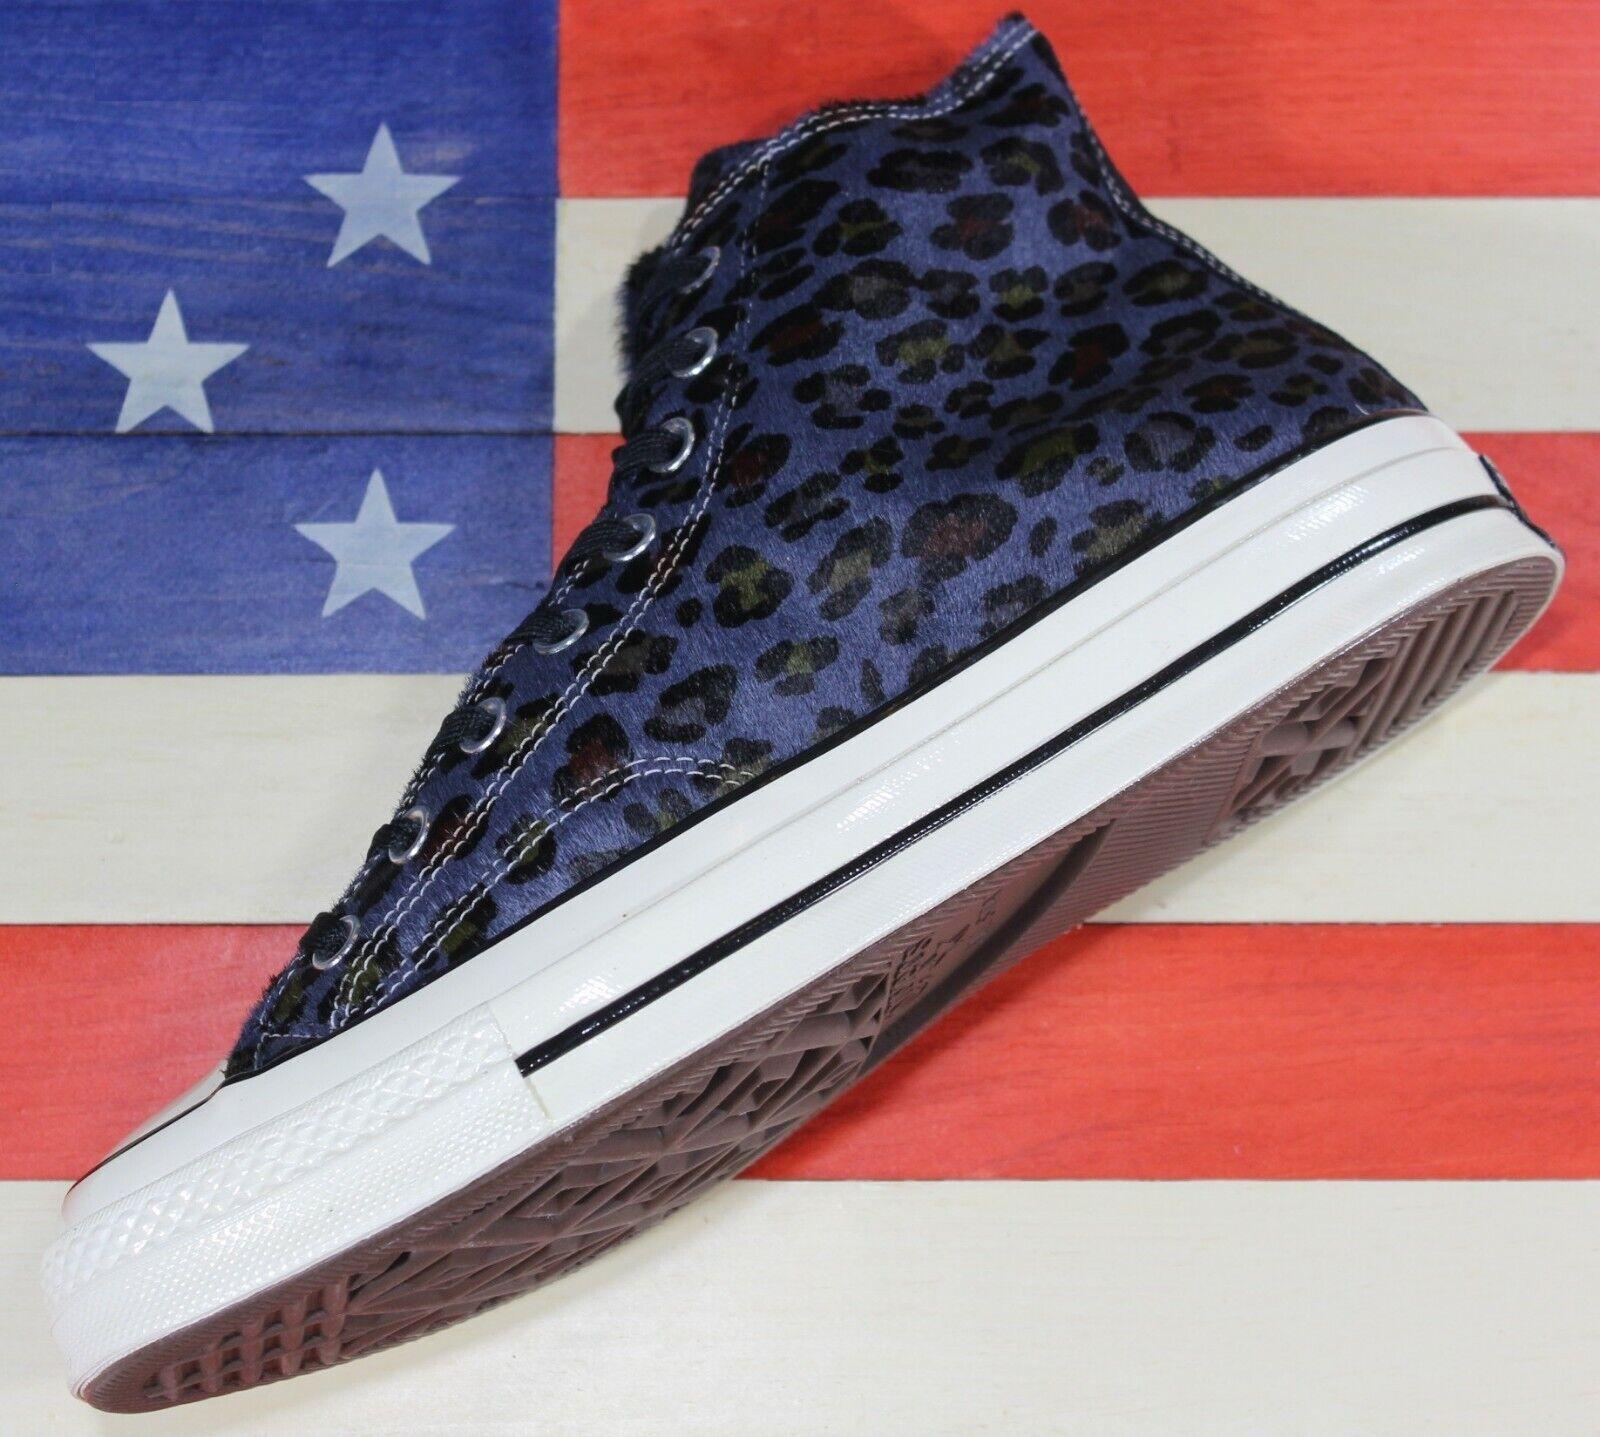 CONVERSE Chuck Taylor SAMPLE ALL-STAR HI Leopard Cheetah Fur chaussures Men 9